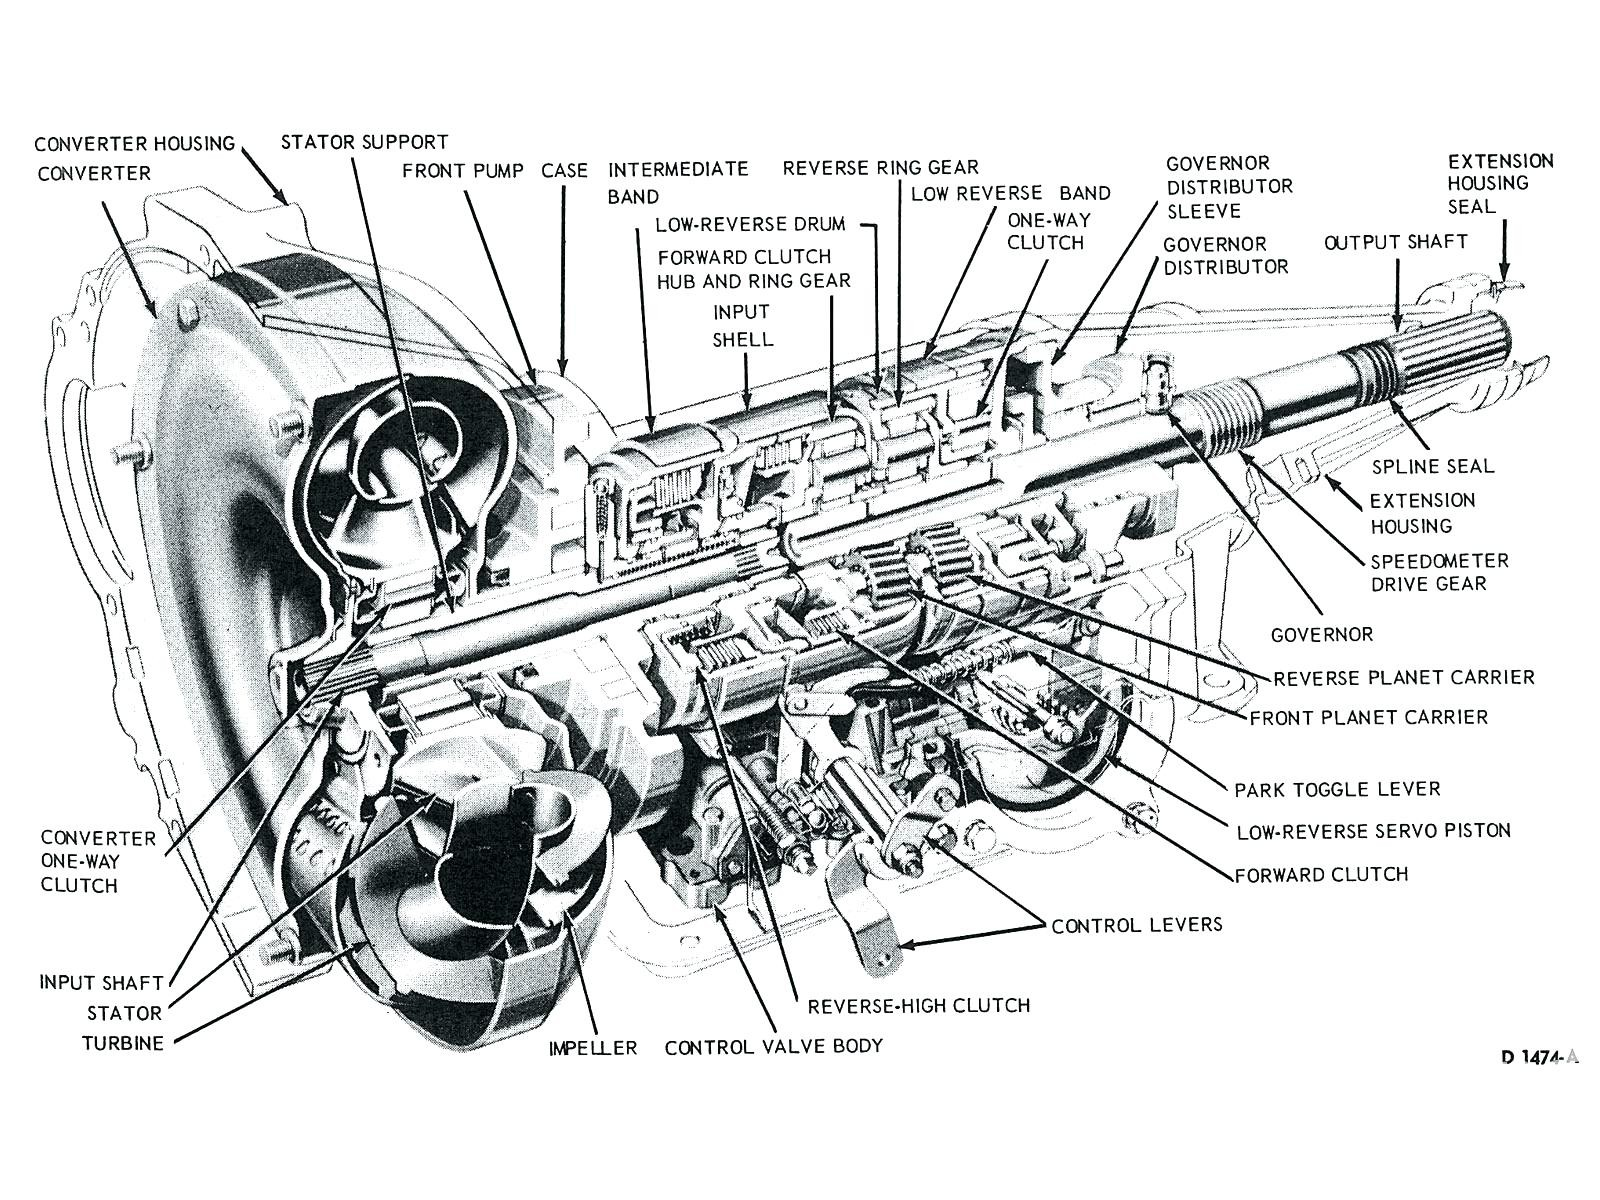 straight 6 engine diagram 4 cylinder diesel engine diagram horse car rh detoxicrecenze com Chevy Inline 6 Cylinder Engines Vortec 6 Cylinder Engines